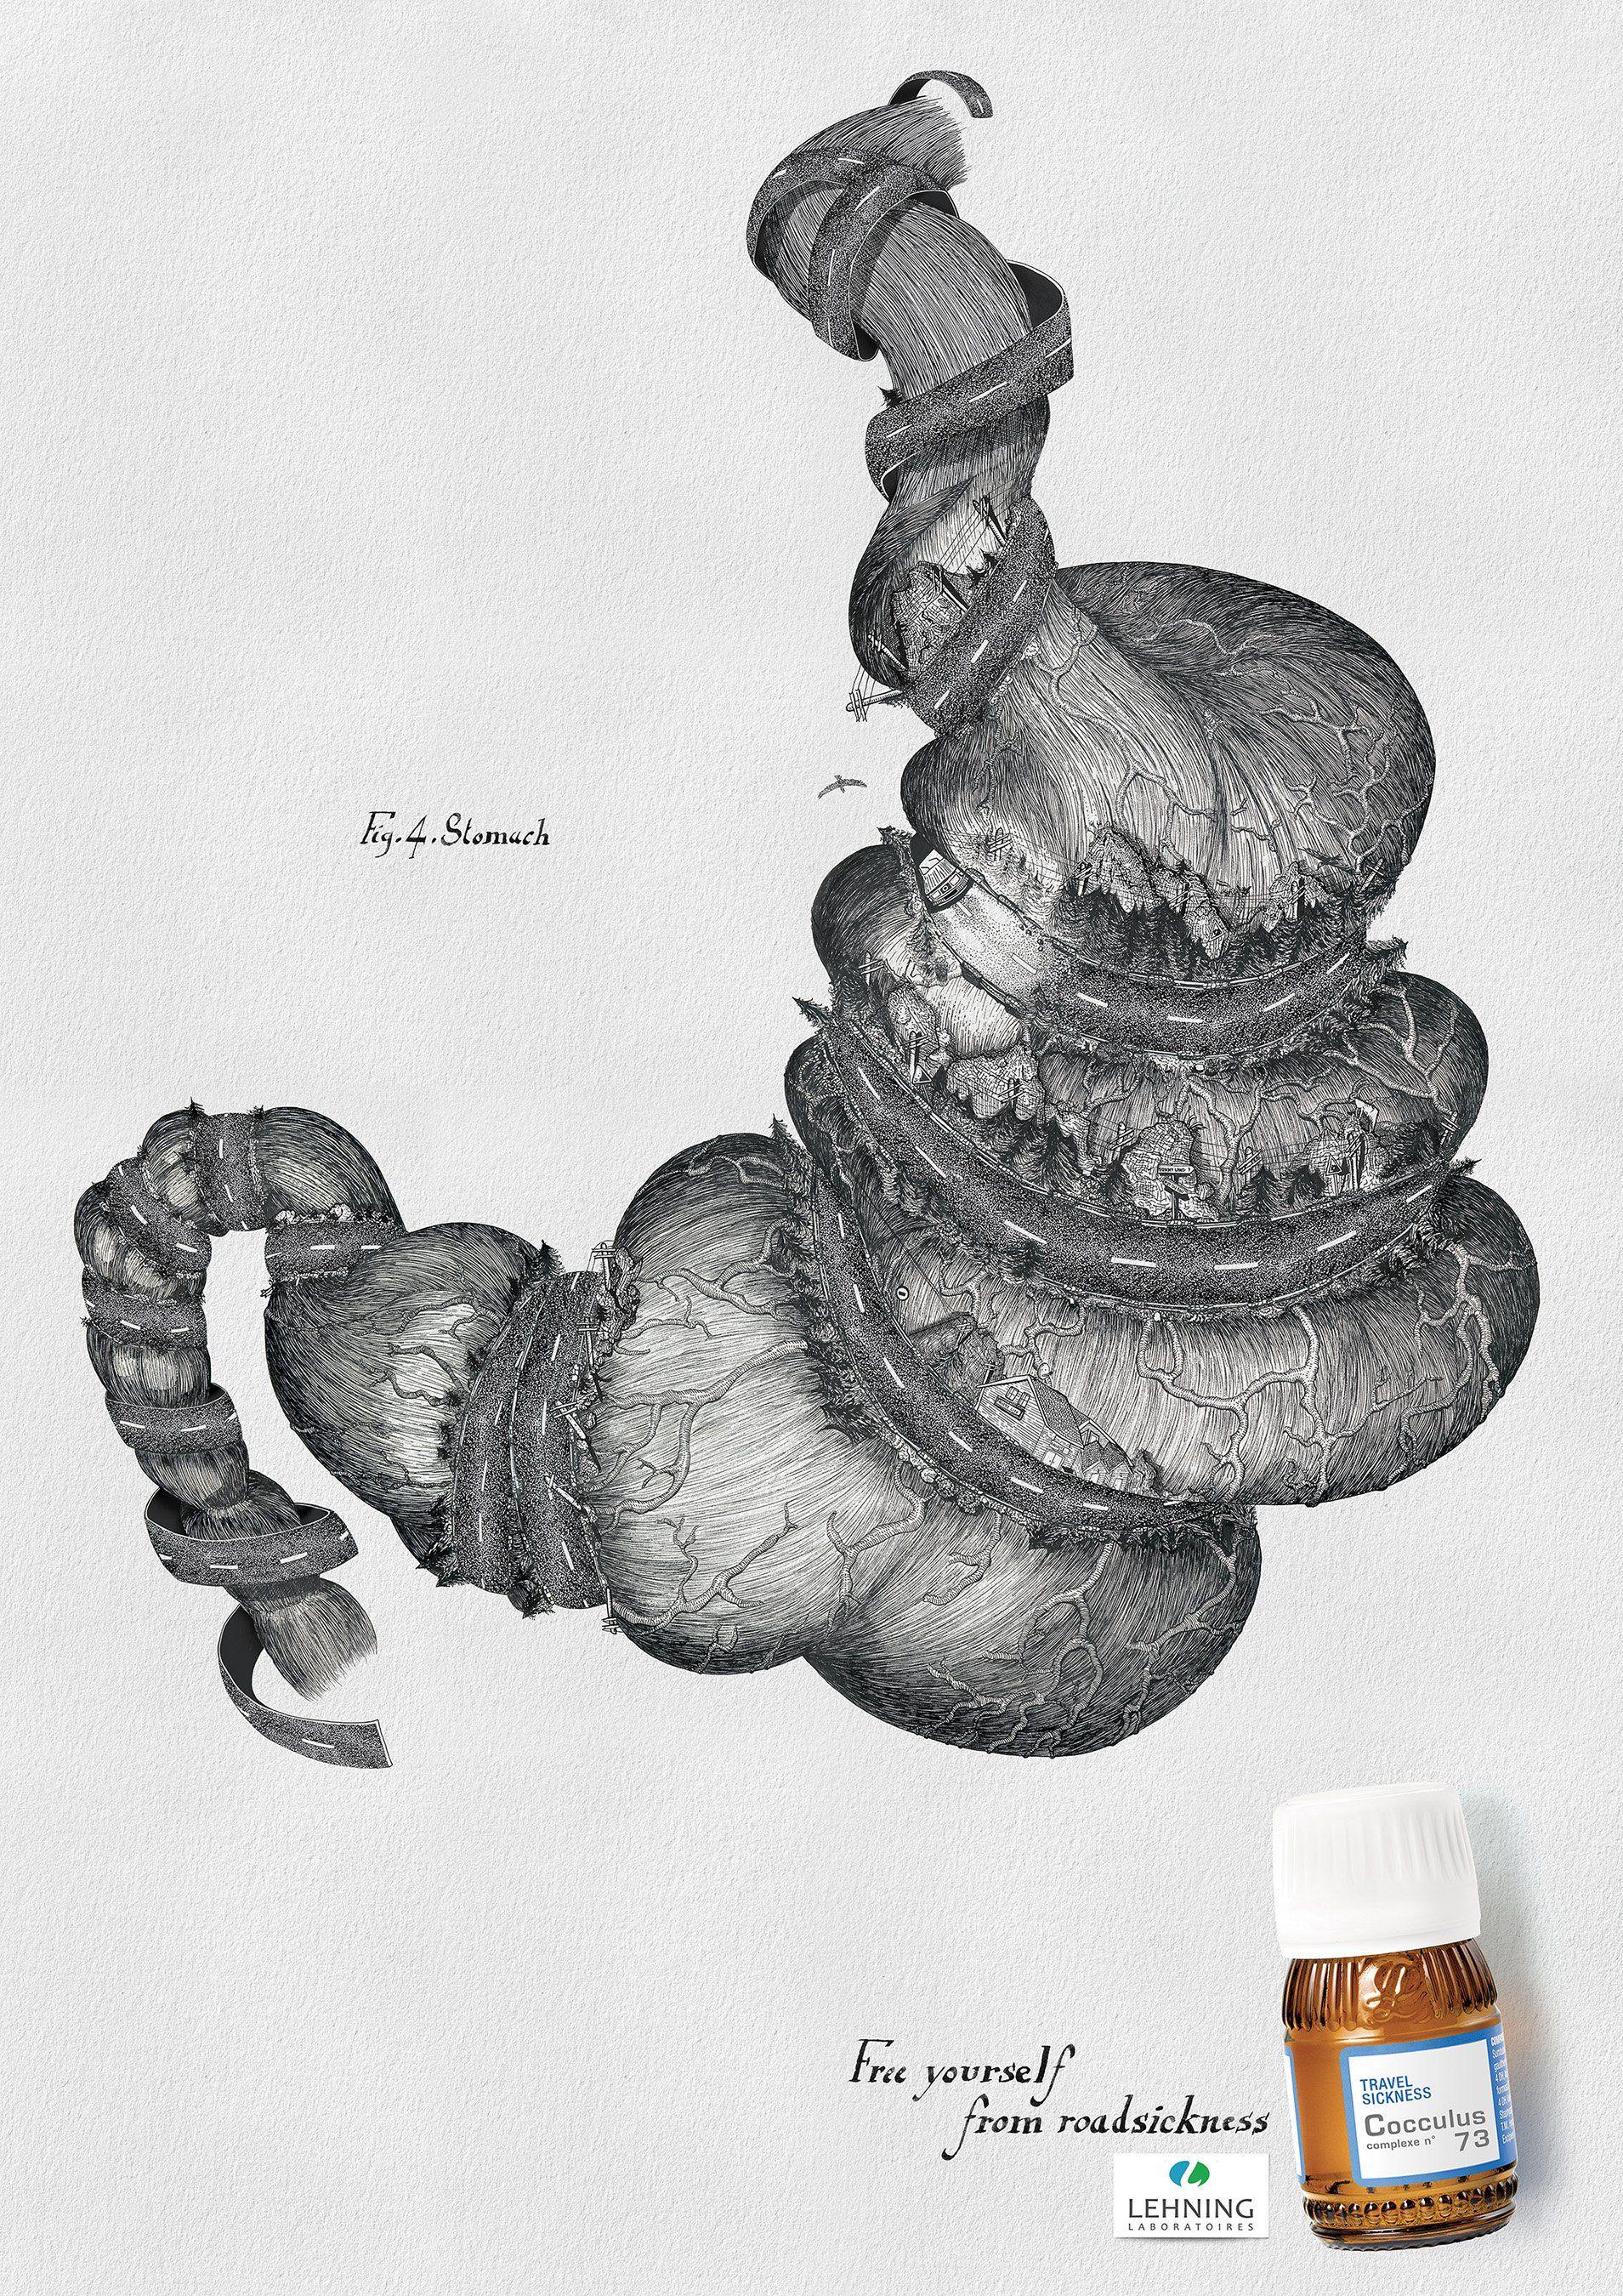 lehning-coculus-73-free-yourself-from-travel-sickness-outdoor-print-372982-adeevee.jpg (1909×2700)